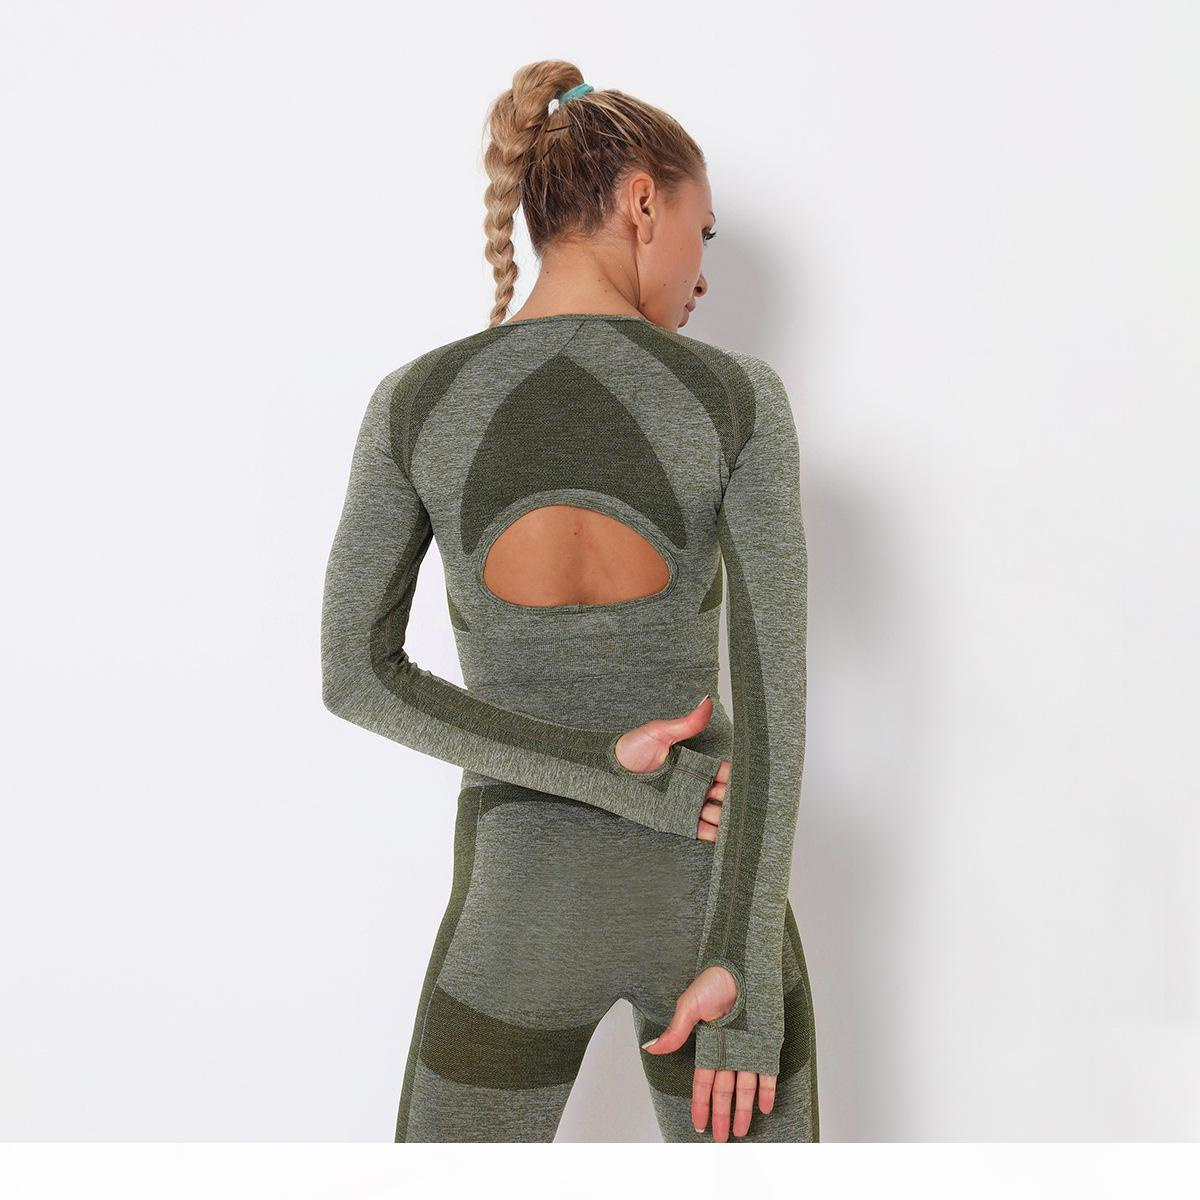 Designer autunno yoga sportswear tuta titoli fitness 2pcs leggings full leggings due pezzi set abiti all'aperto sport backless gymshark abbigliamento womans